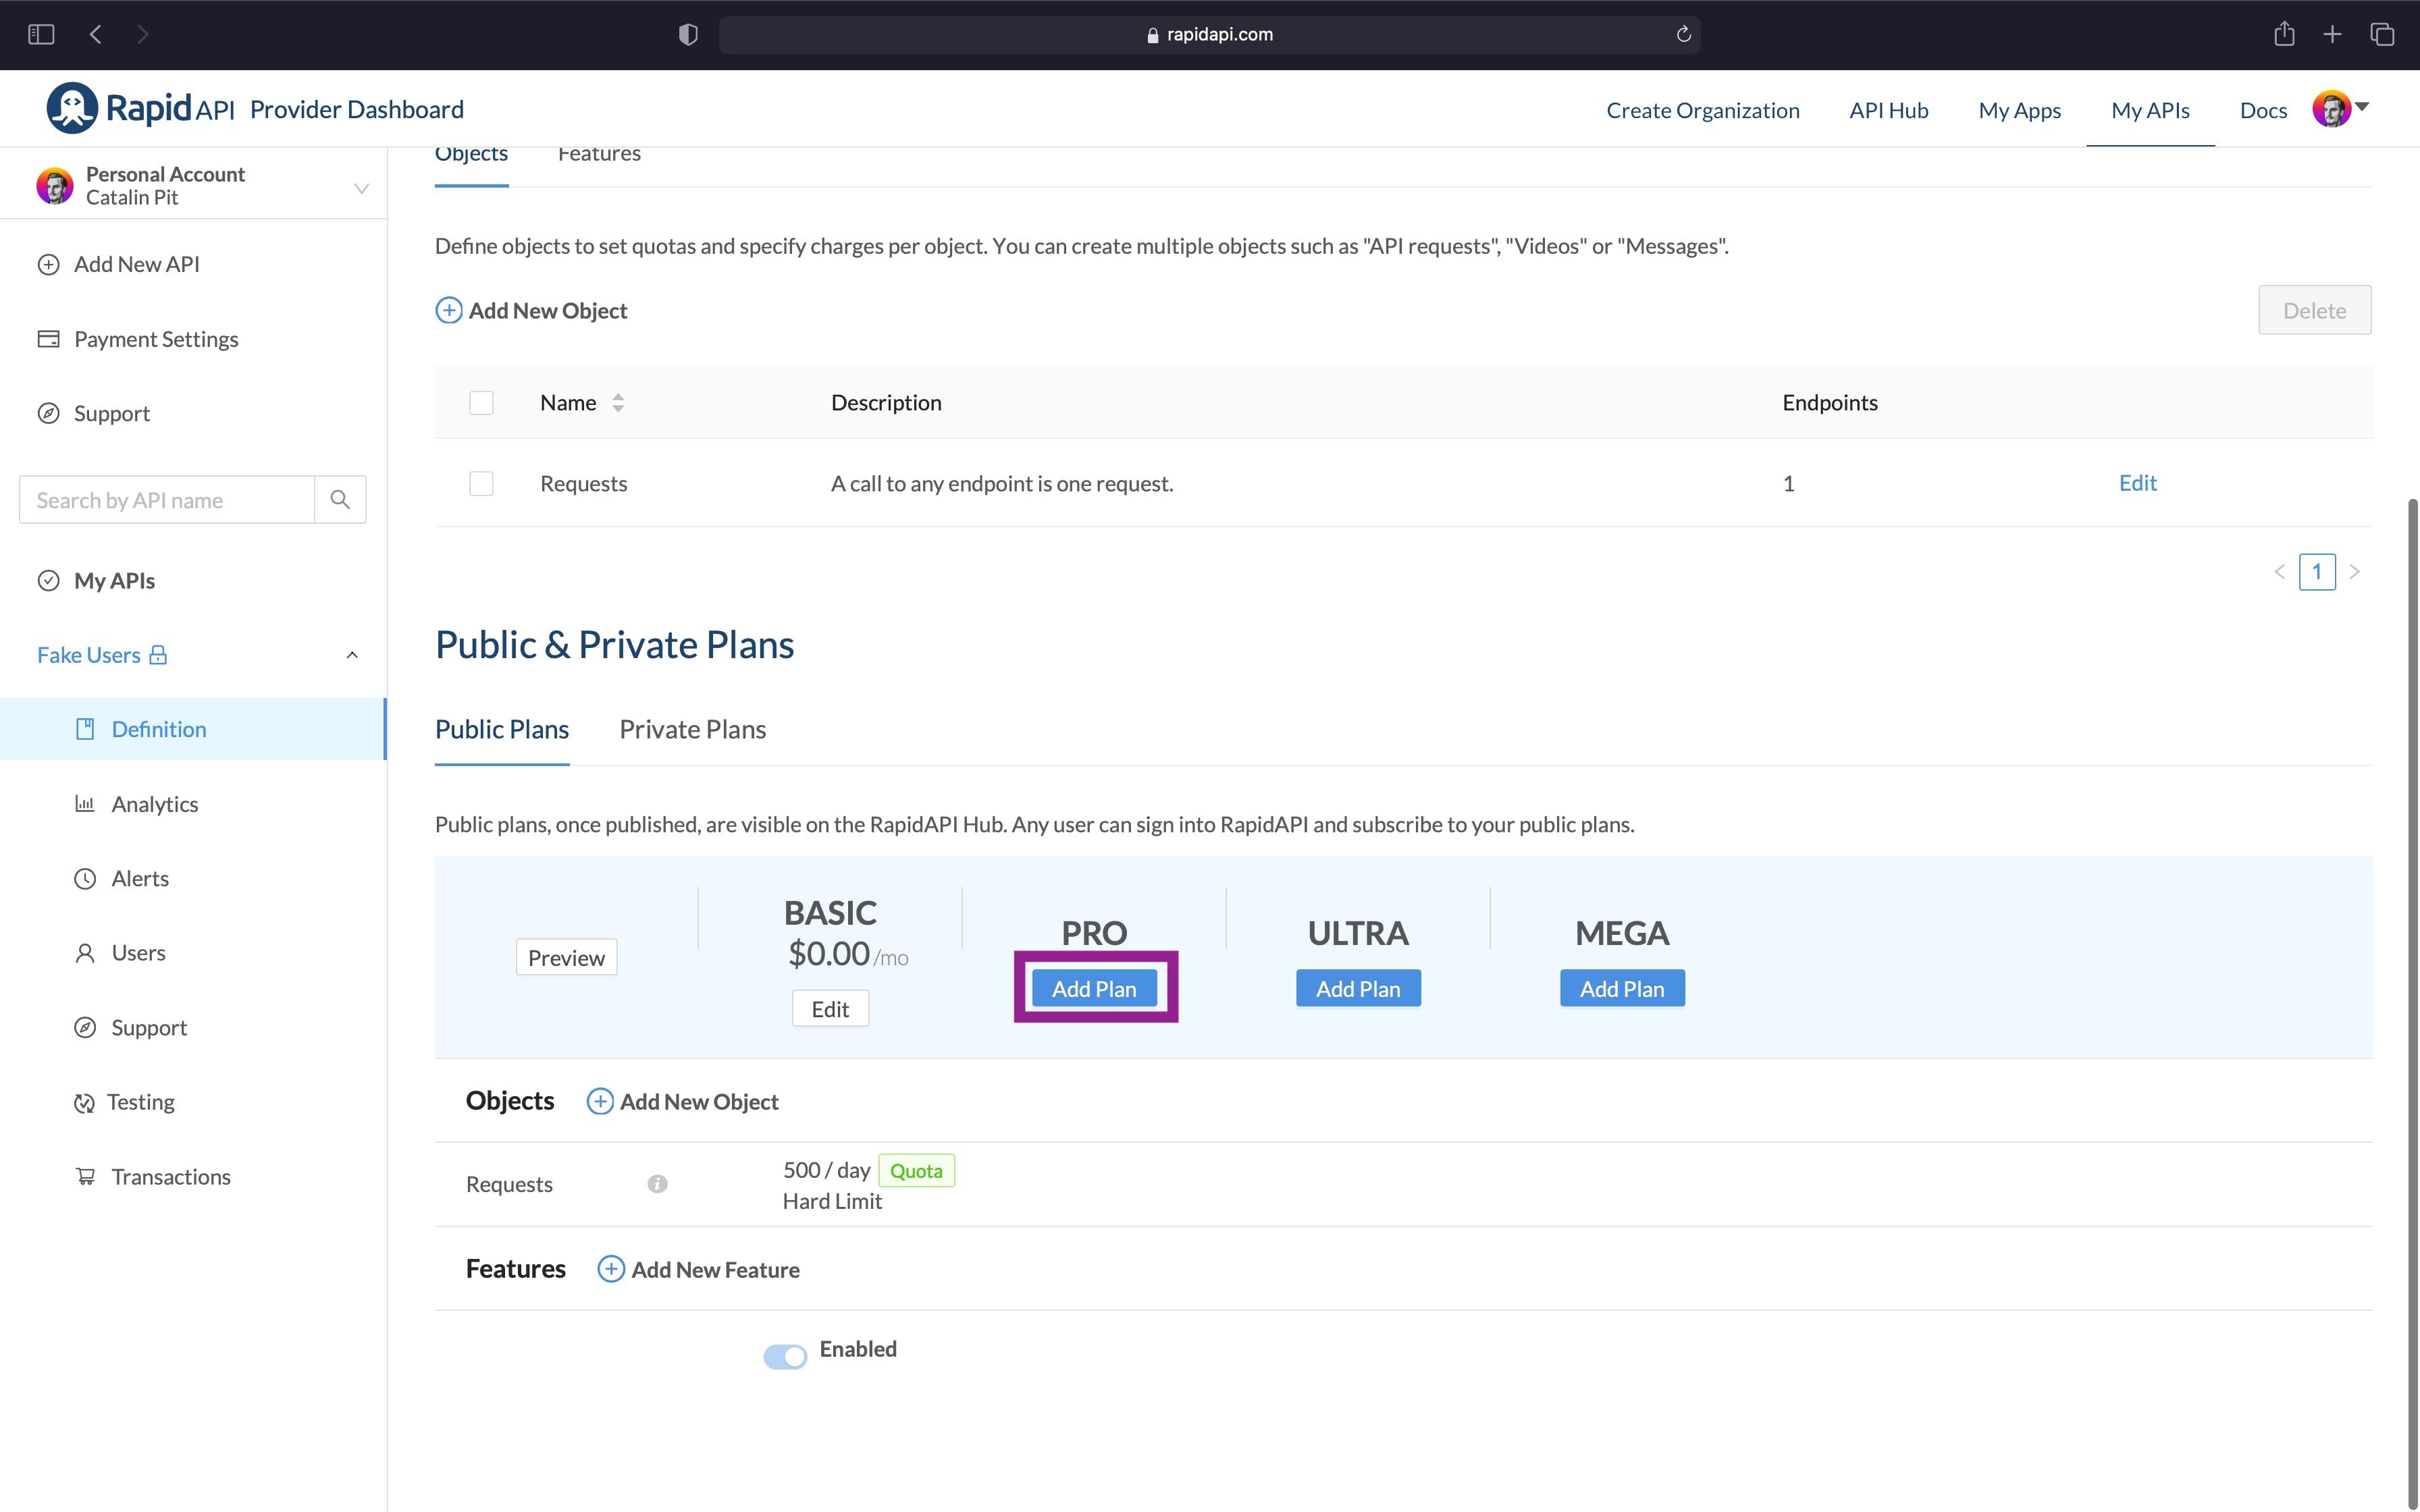 RapidAPI Provider Dashboard Public and Private Plans